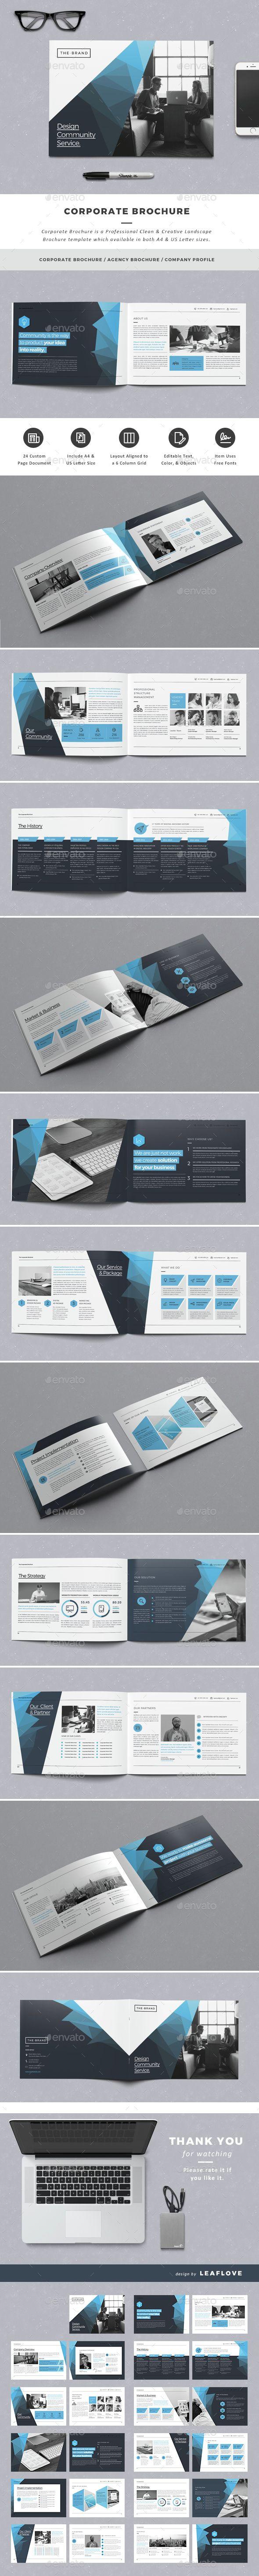 Corporate Brochure Template InDesign INDD. Download here: http://graphicriver.net/item/corporate-brochure/14957706?ref=ksioks